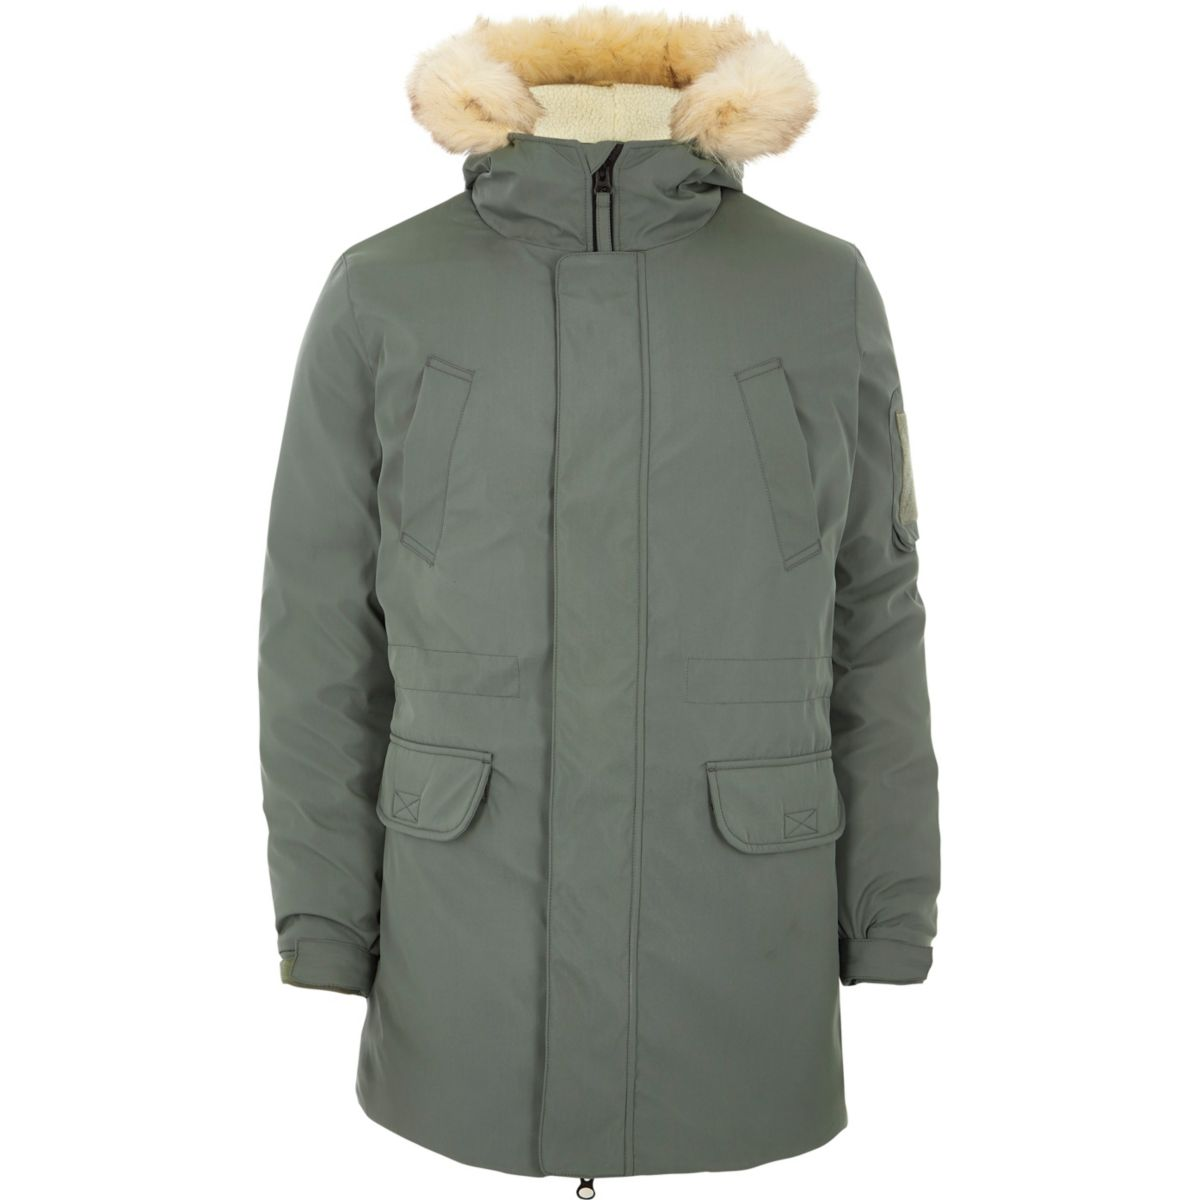 Sage green faux fur trim hooded parka